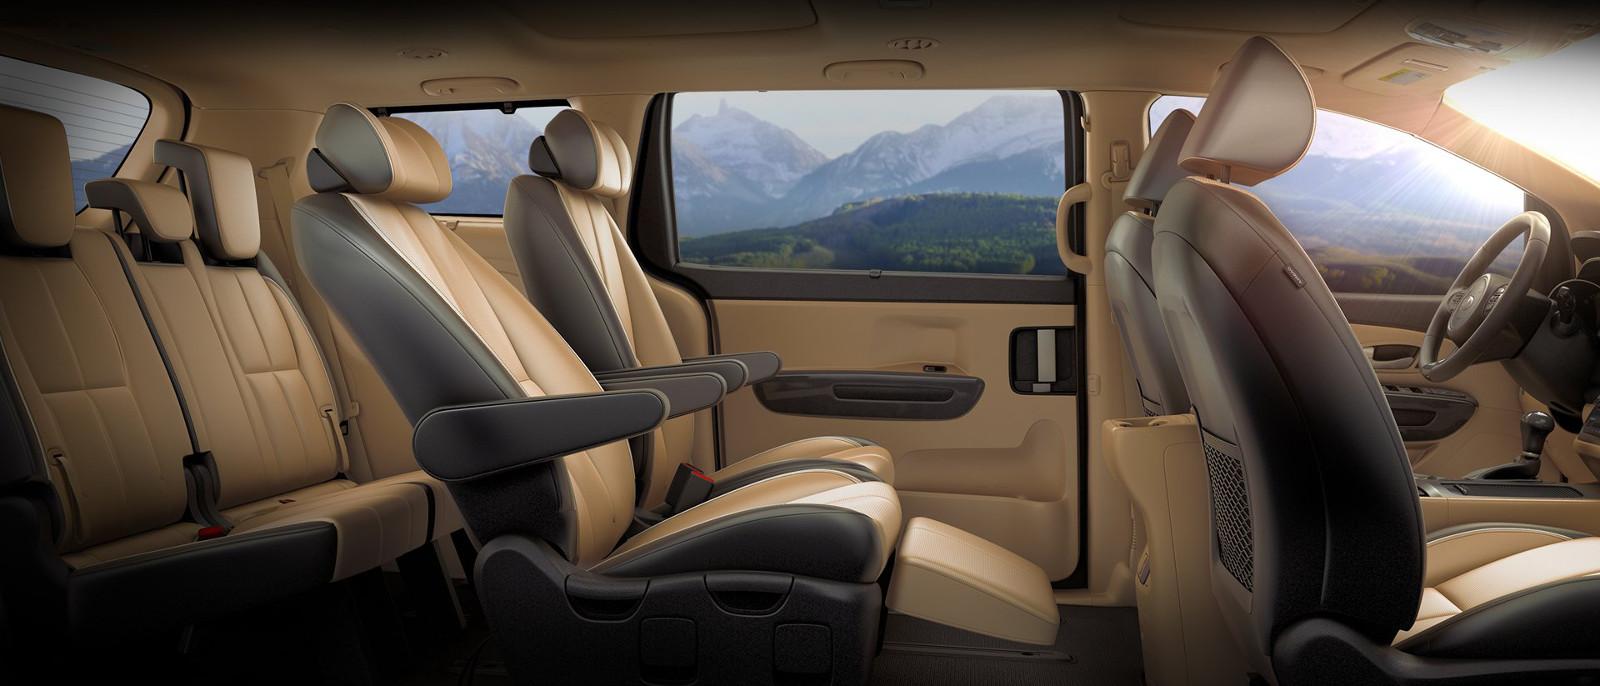 2016 Kia Sedona 2017 2018 Best Cars Reviews